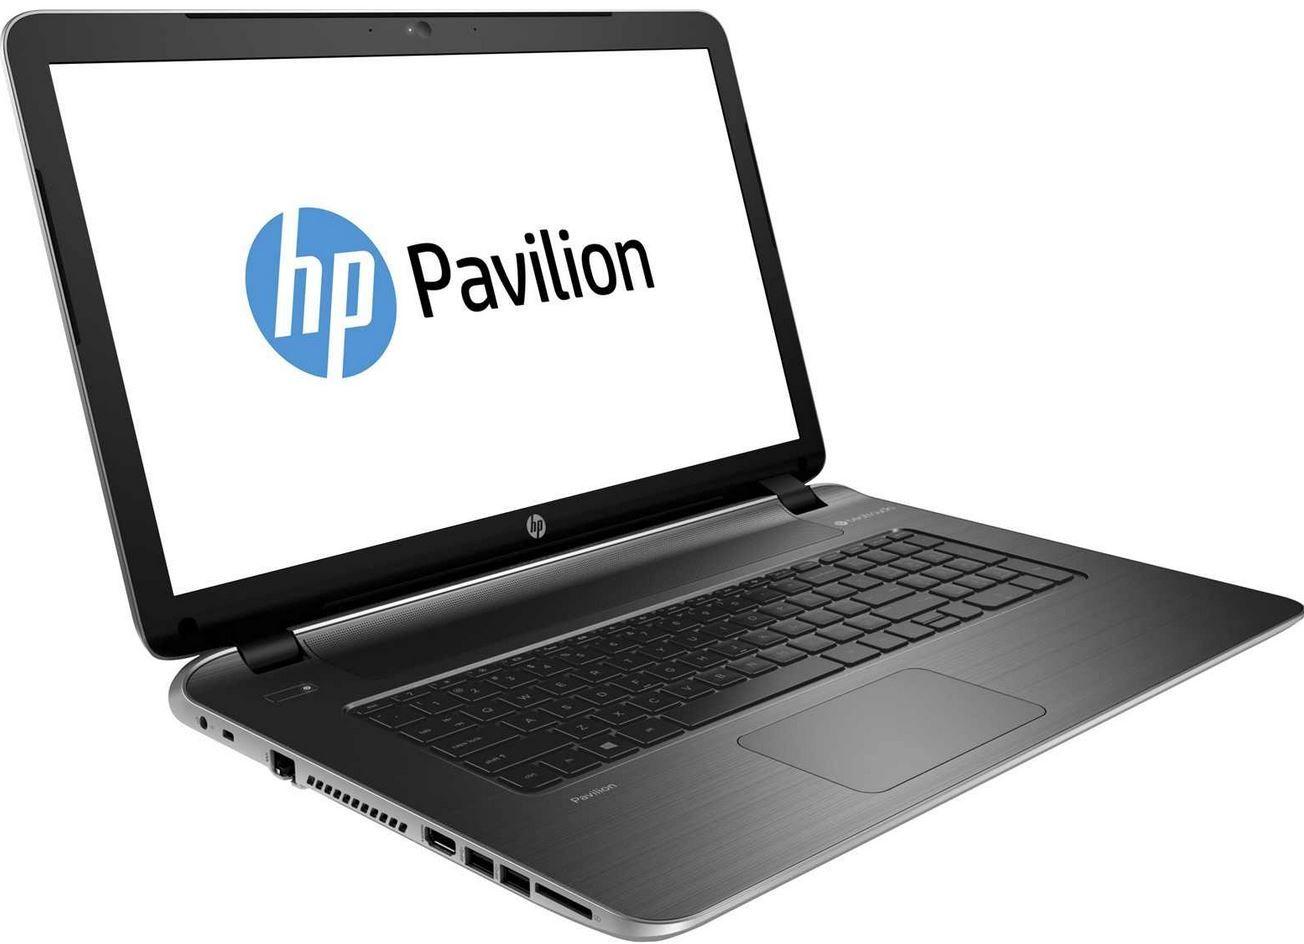 HP Pavilion 17 f050ng   17,3 Notebook mit AMD Quad Core für 339€